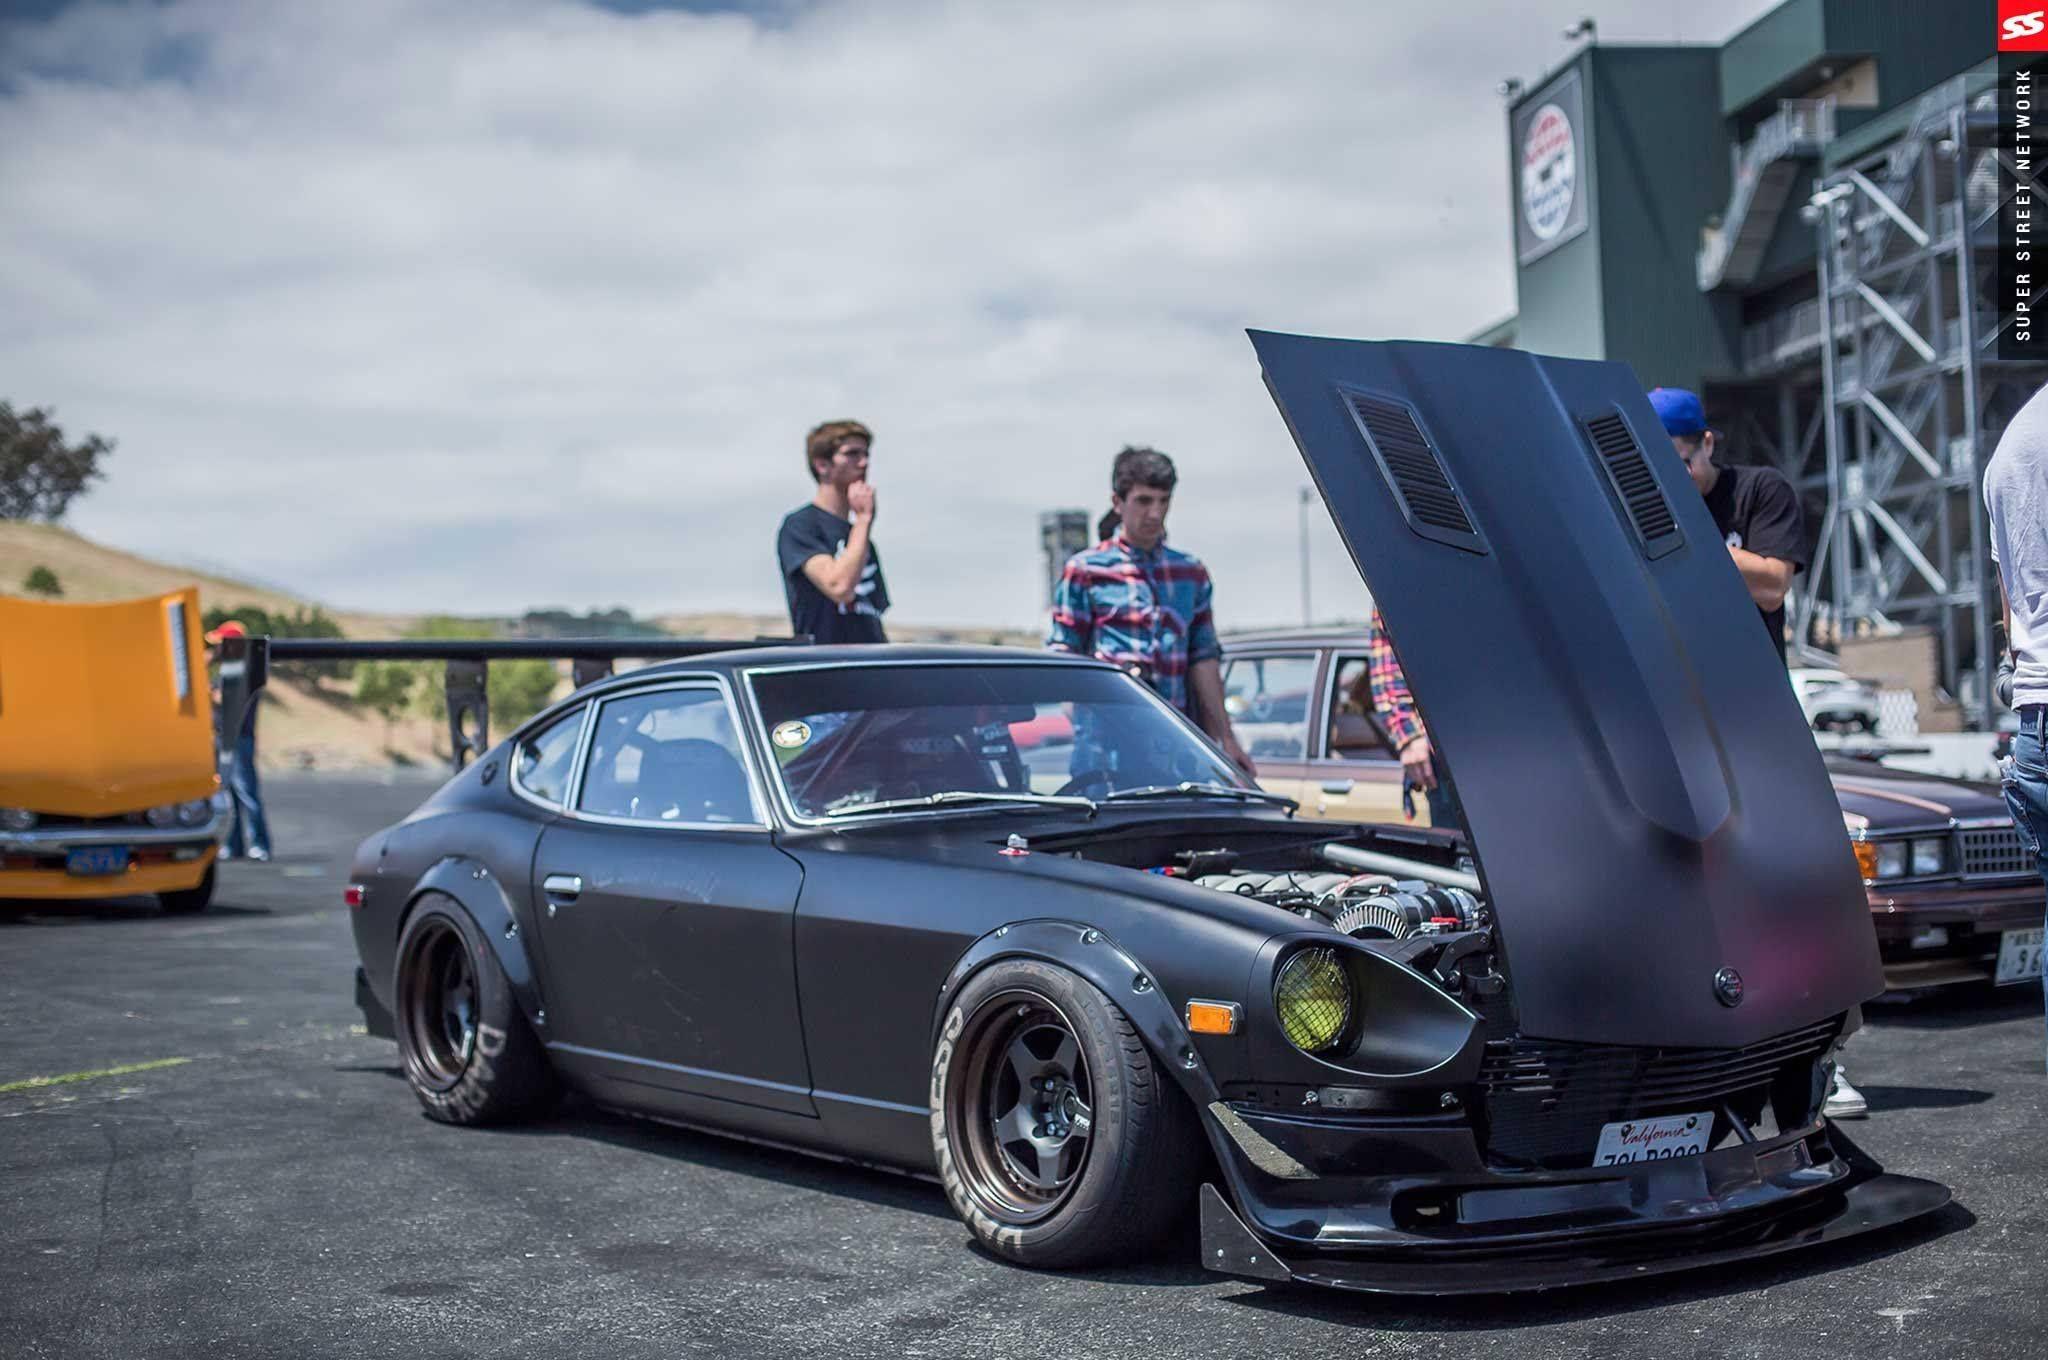 Datsun Z car | Perfect Car Style | Pinterest | Cars, Jdm and Nissan